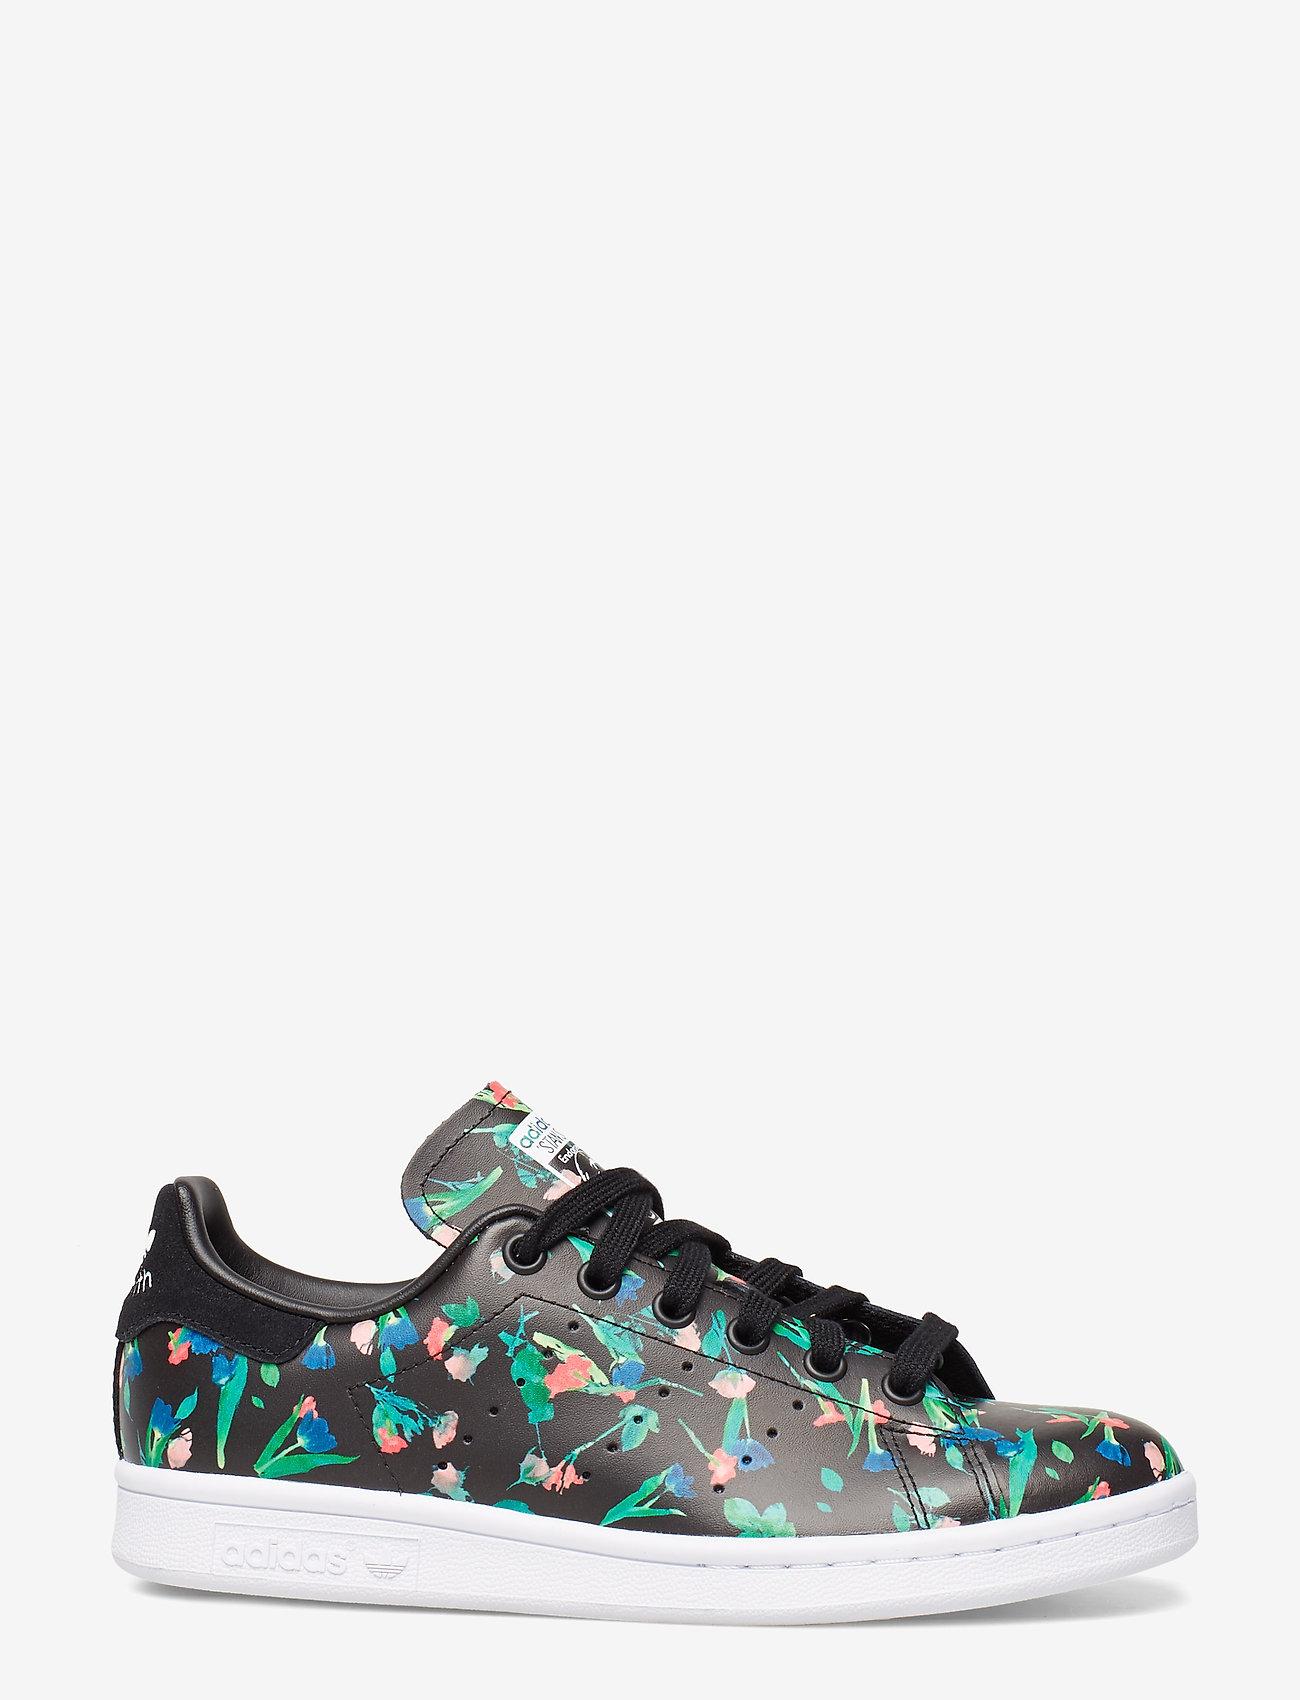 Stan Smith W (Cblack/ftwwht/cblack) (479.40 kr) - adidas Originals